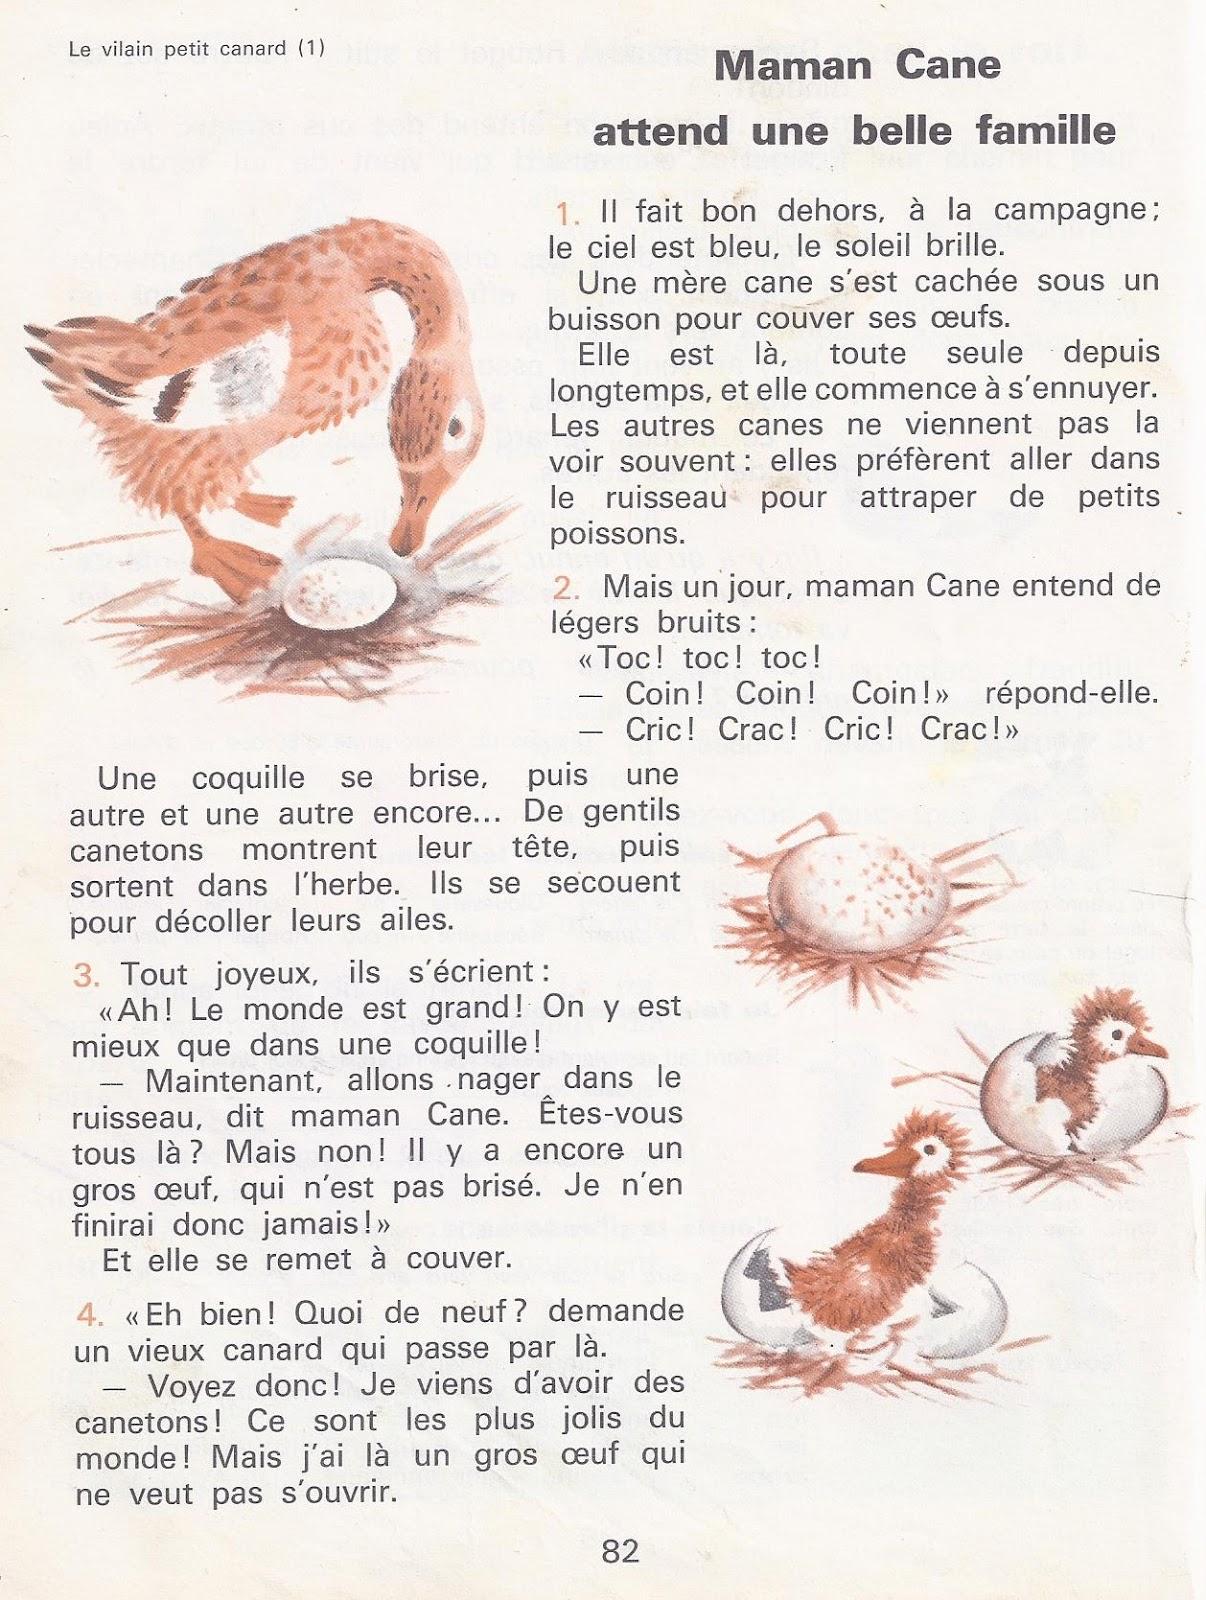 Le Vilain Petit Canard Texte : vilain, petit, canard, texte, école, Références:, Vilain, Petit, Canard